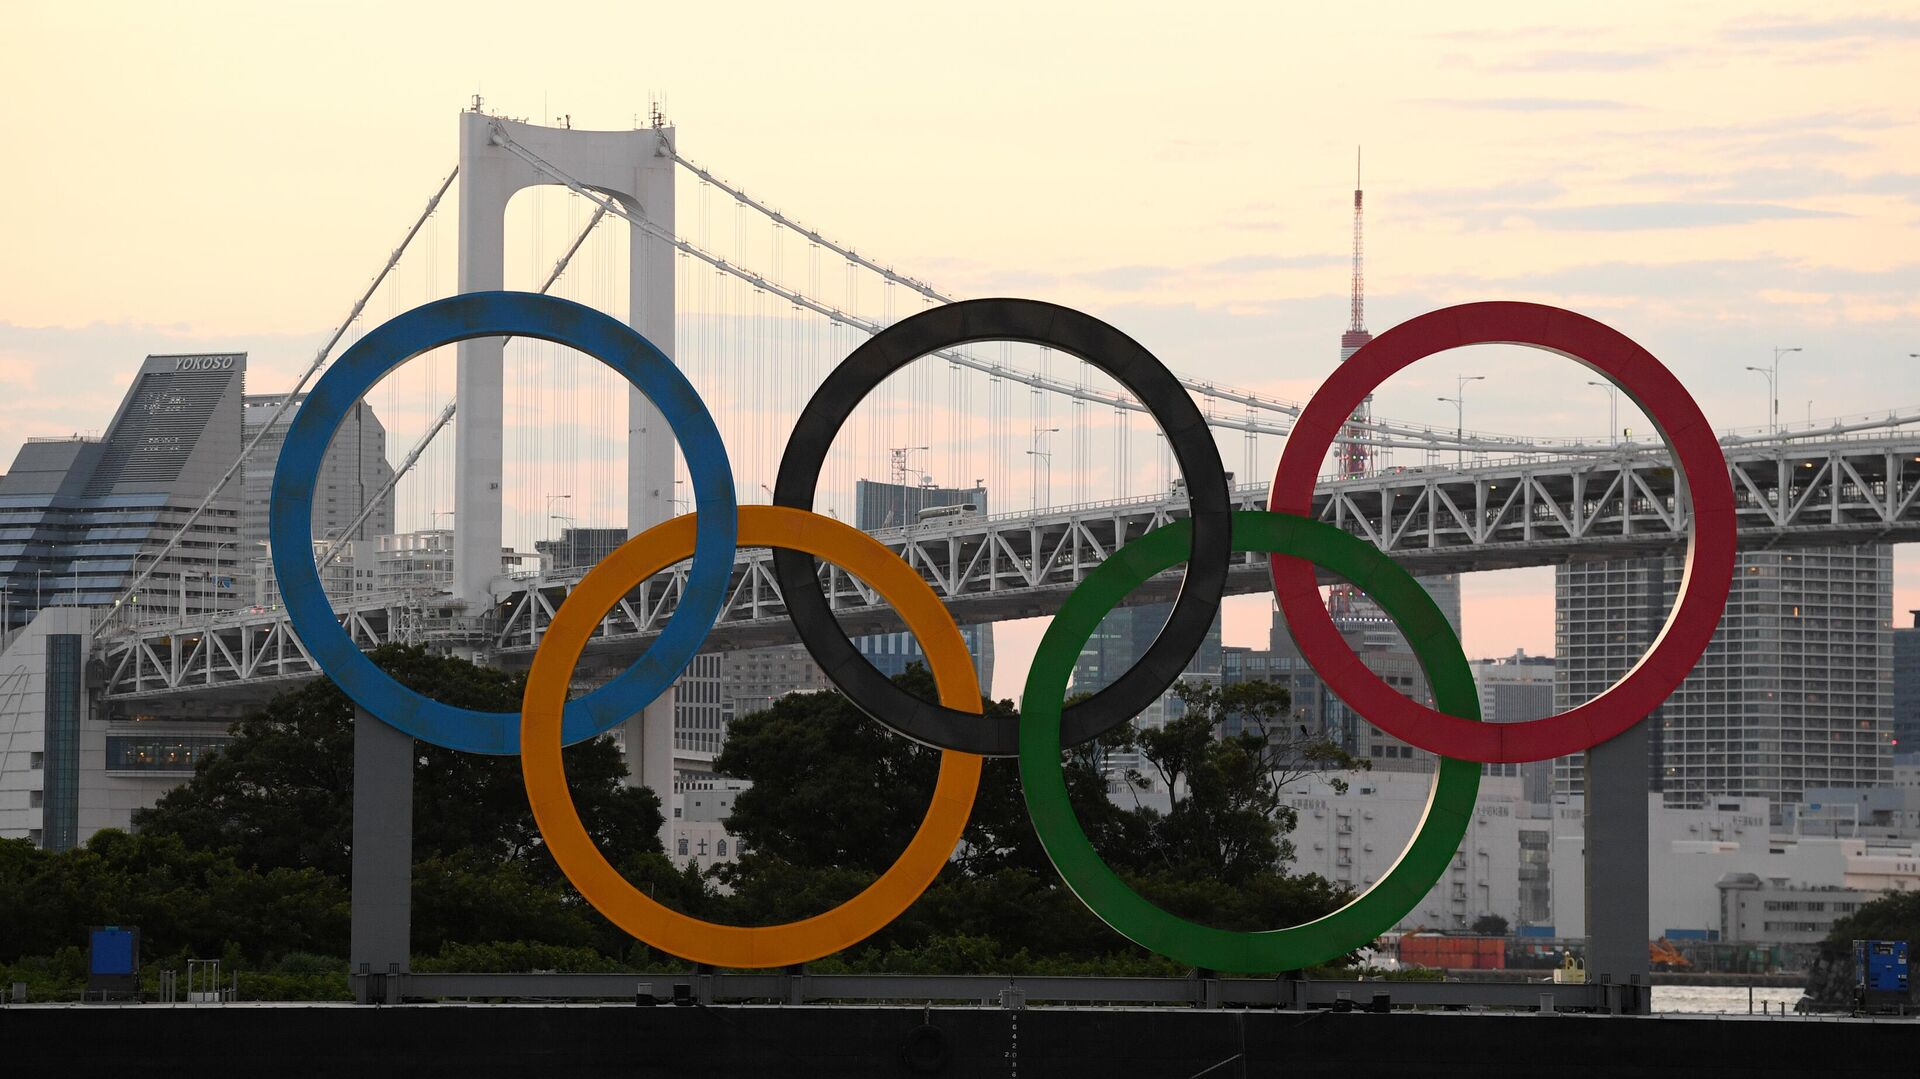 Токио накануне открытия Олимпийских игр - РИА Новости, 1920, 27.07.2021